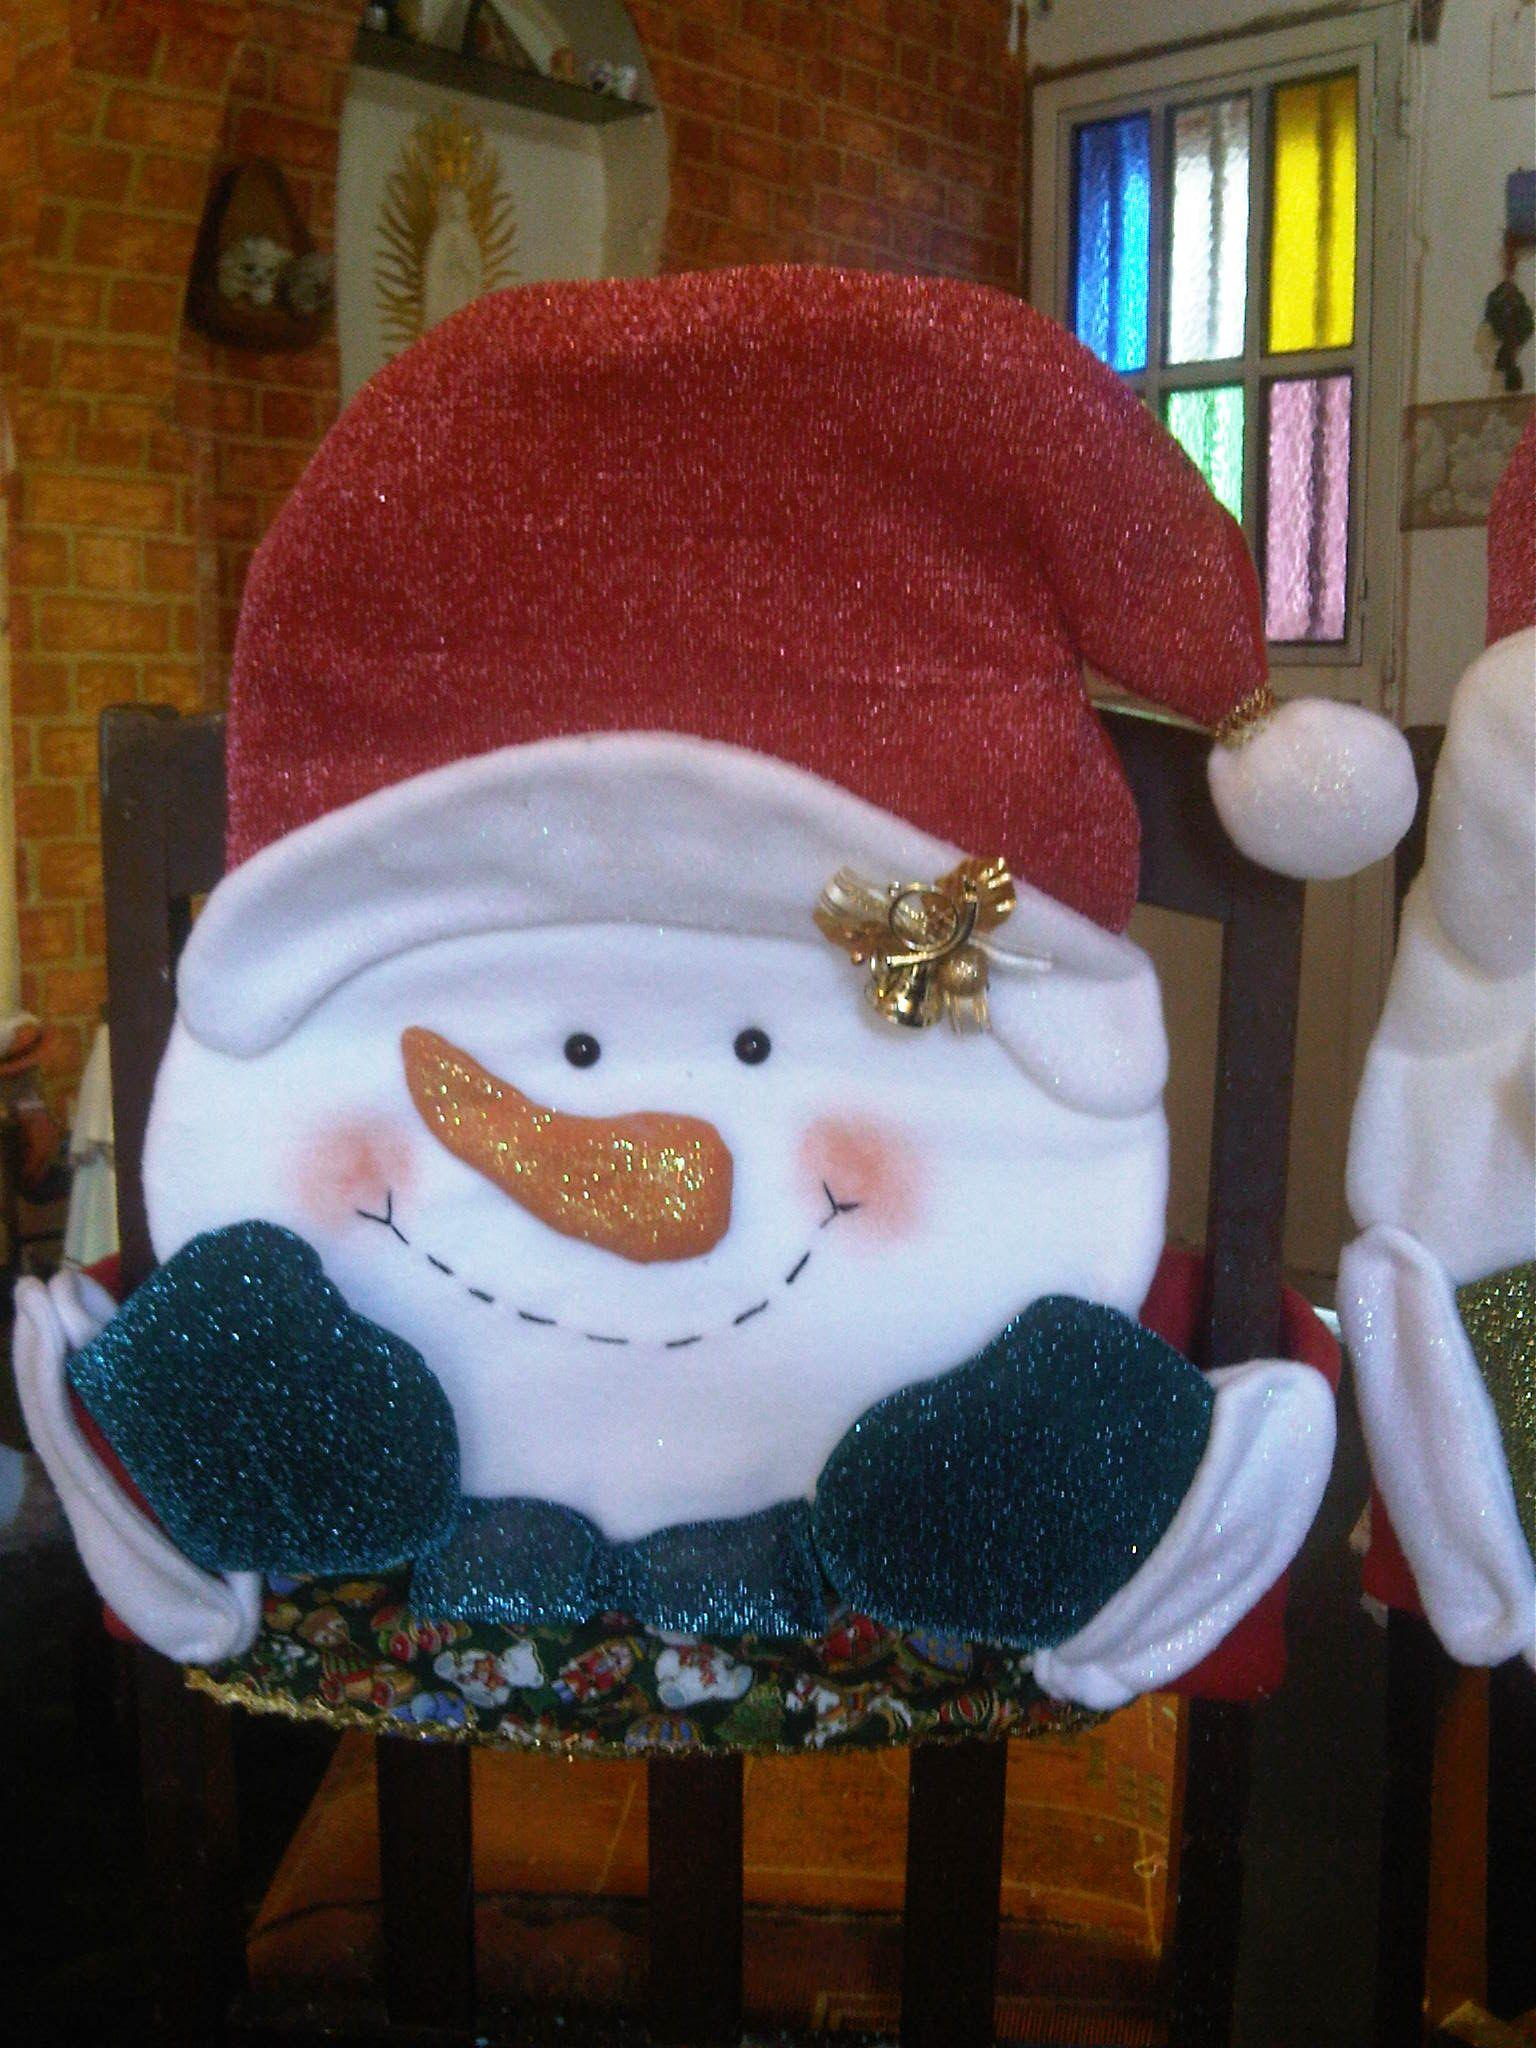 christmas chair covers pinterest wedding cover hire buckinghamshire forro de sillas nieve navidad